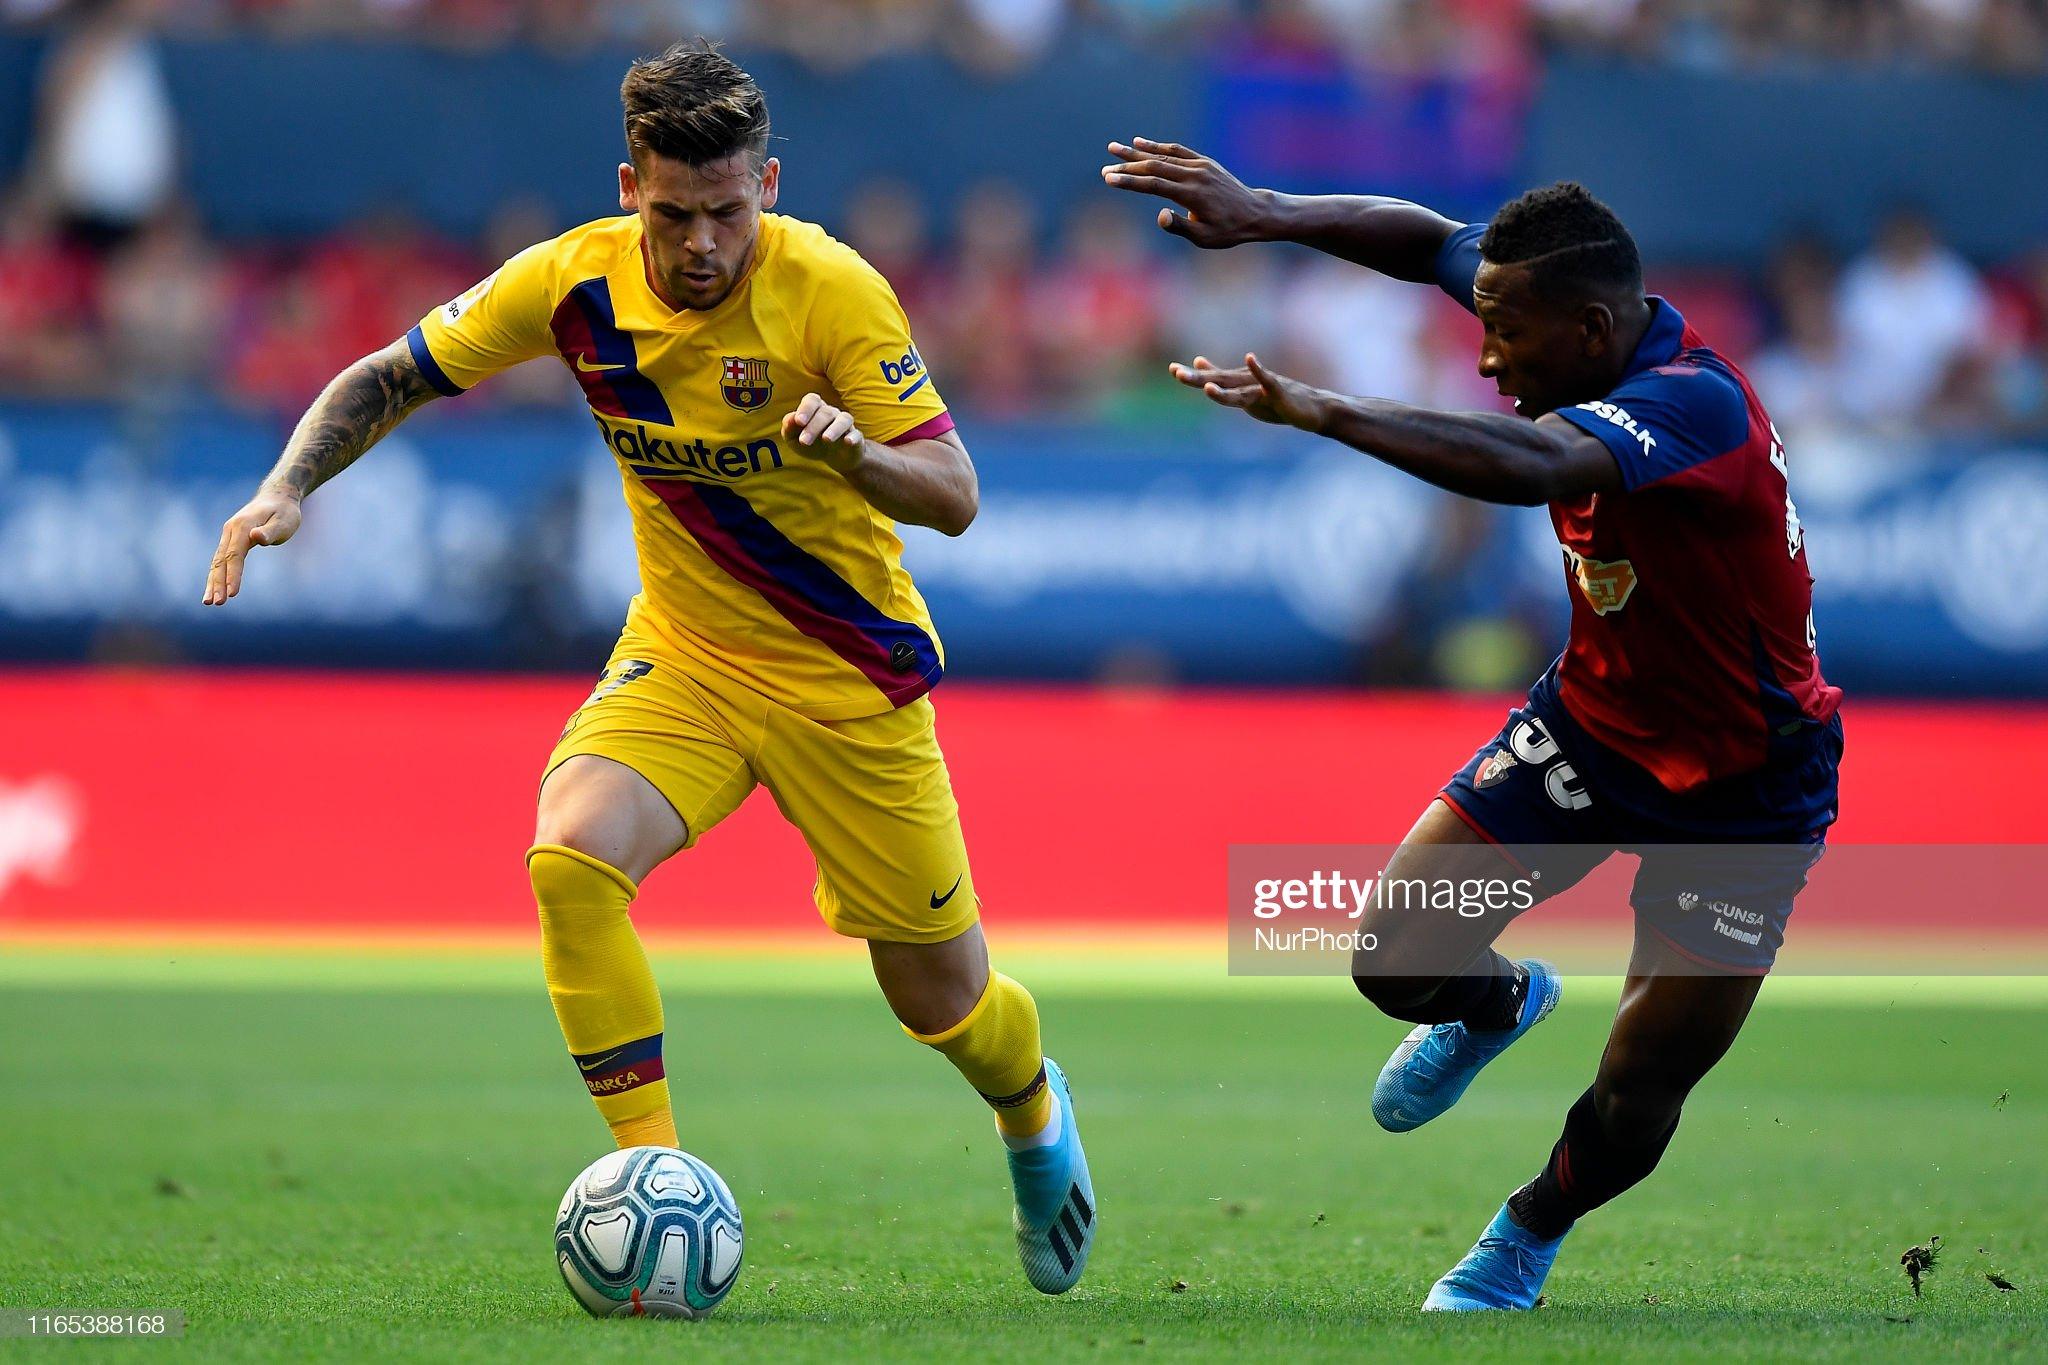 صور مباراة : أوساسونا - برشلونة 2-2 ( 31-08-2019 )  Carles-perez-of-barcelona-and-pervis-estupinan-of-osasuna-competes-picture-id1165388168?s=2048x2048